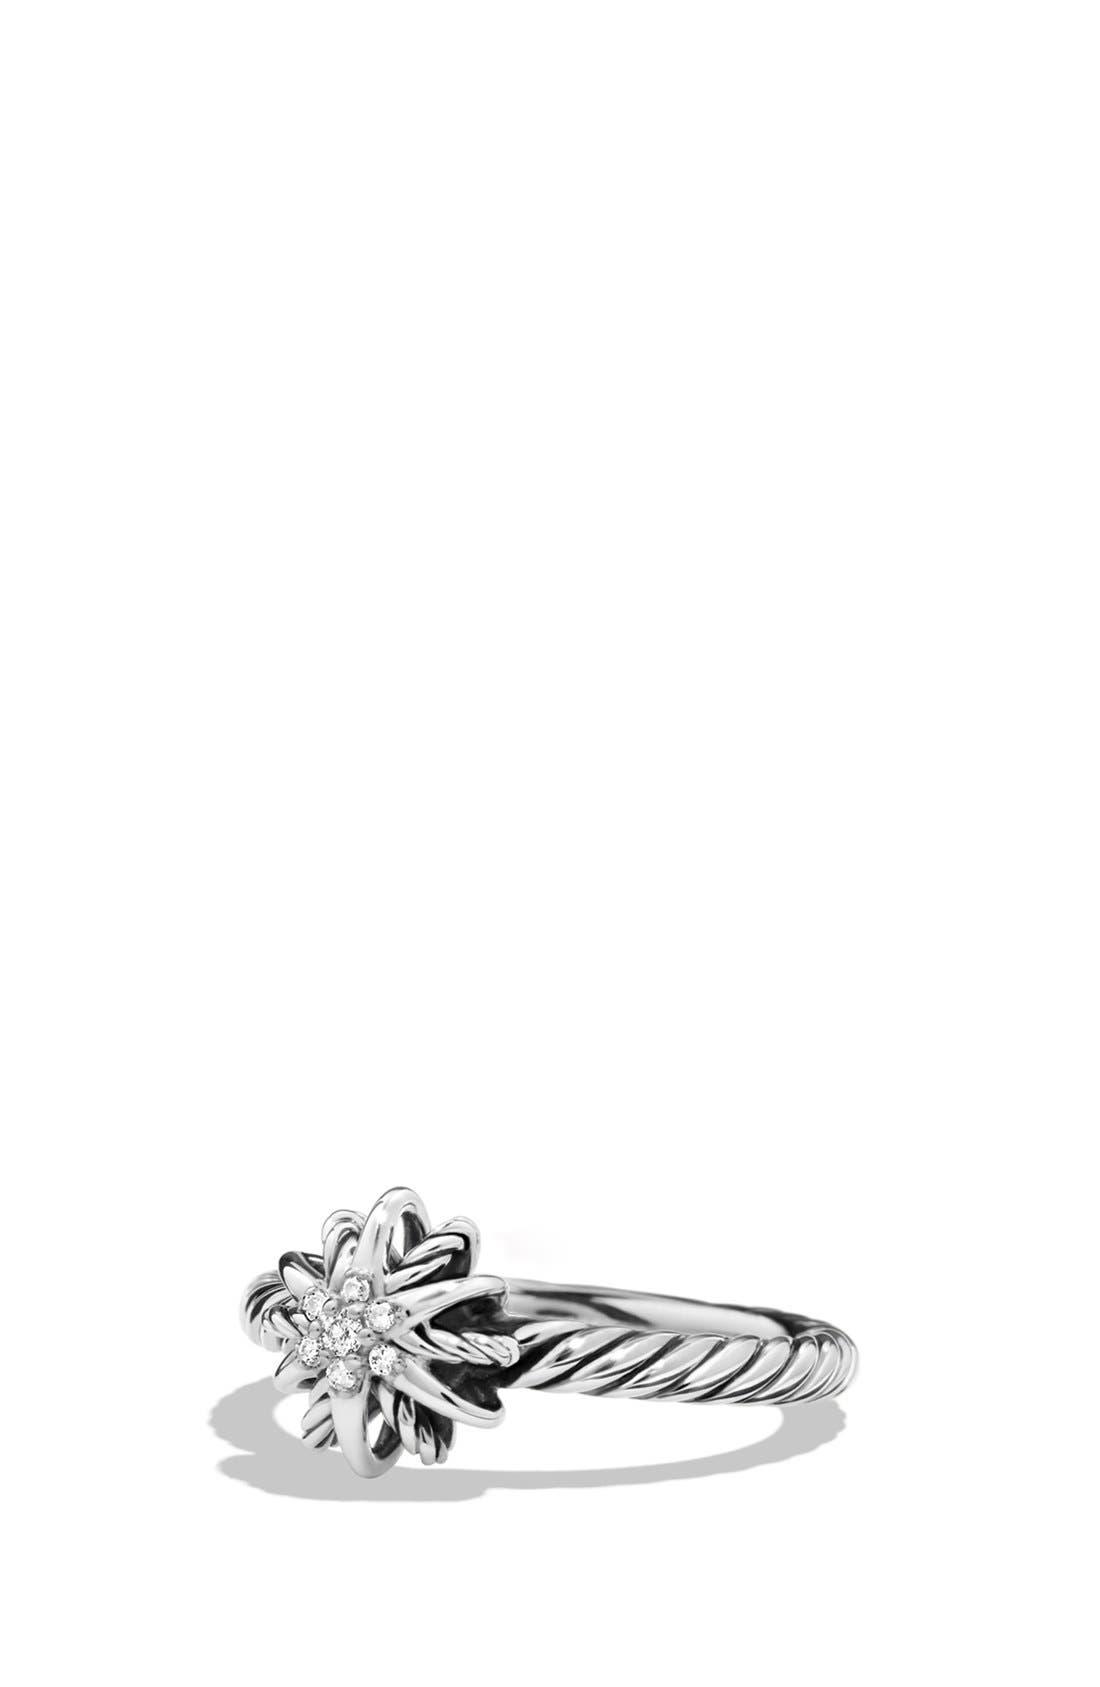 DAVID YURMAN Starburst Ring with Diamonds